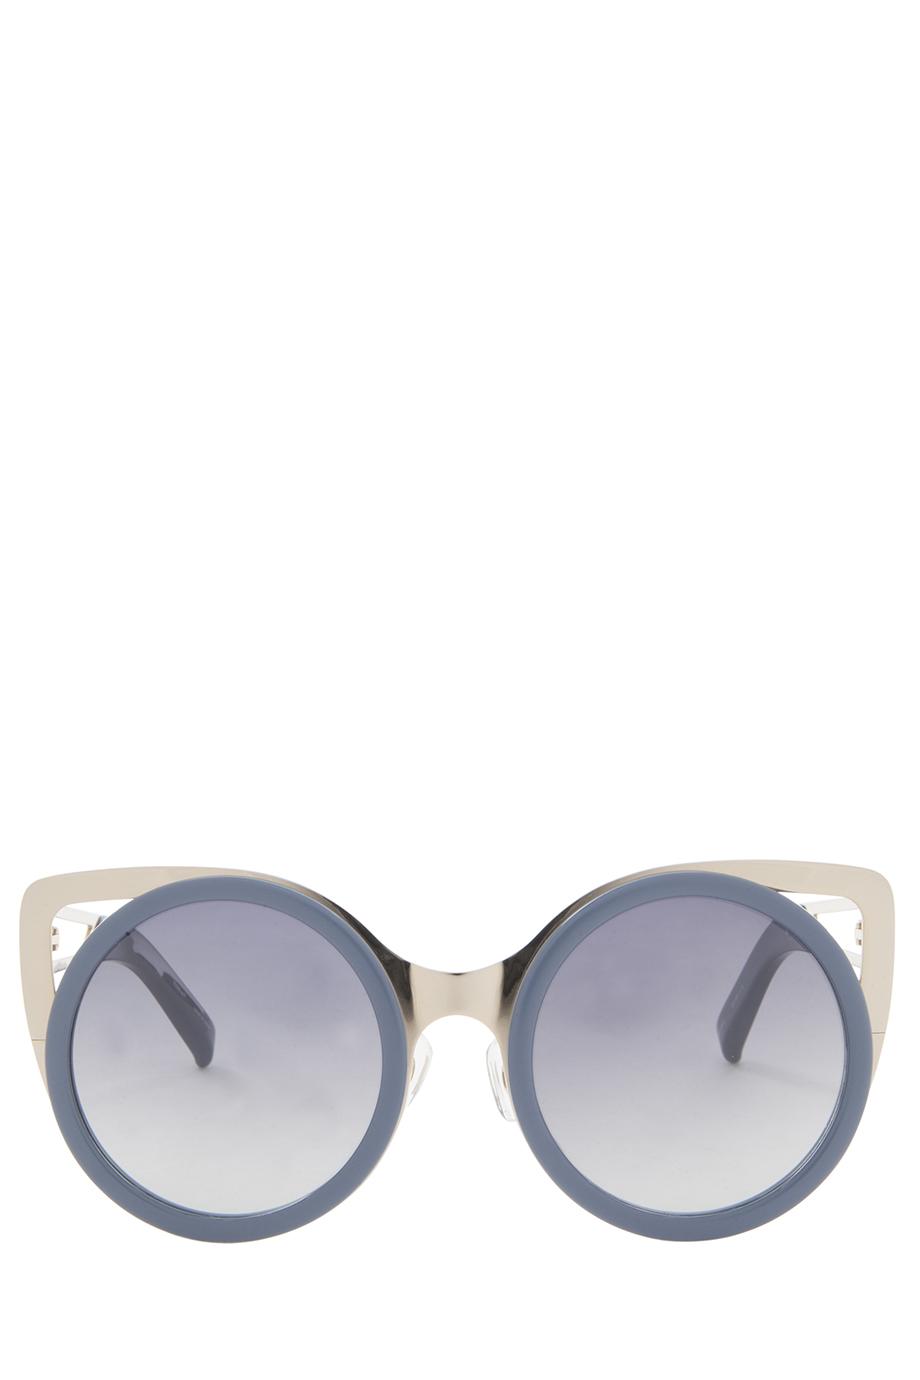 972e7cbe942 Lyst - Erdem X Linda Farrow Cat-eye Sunglasses in Blue